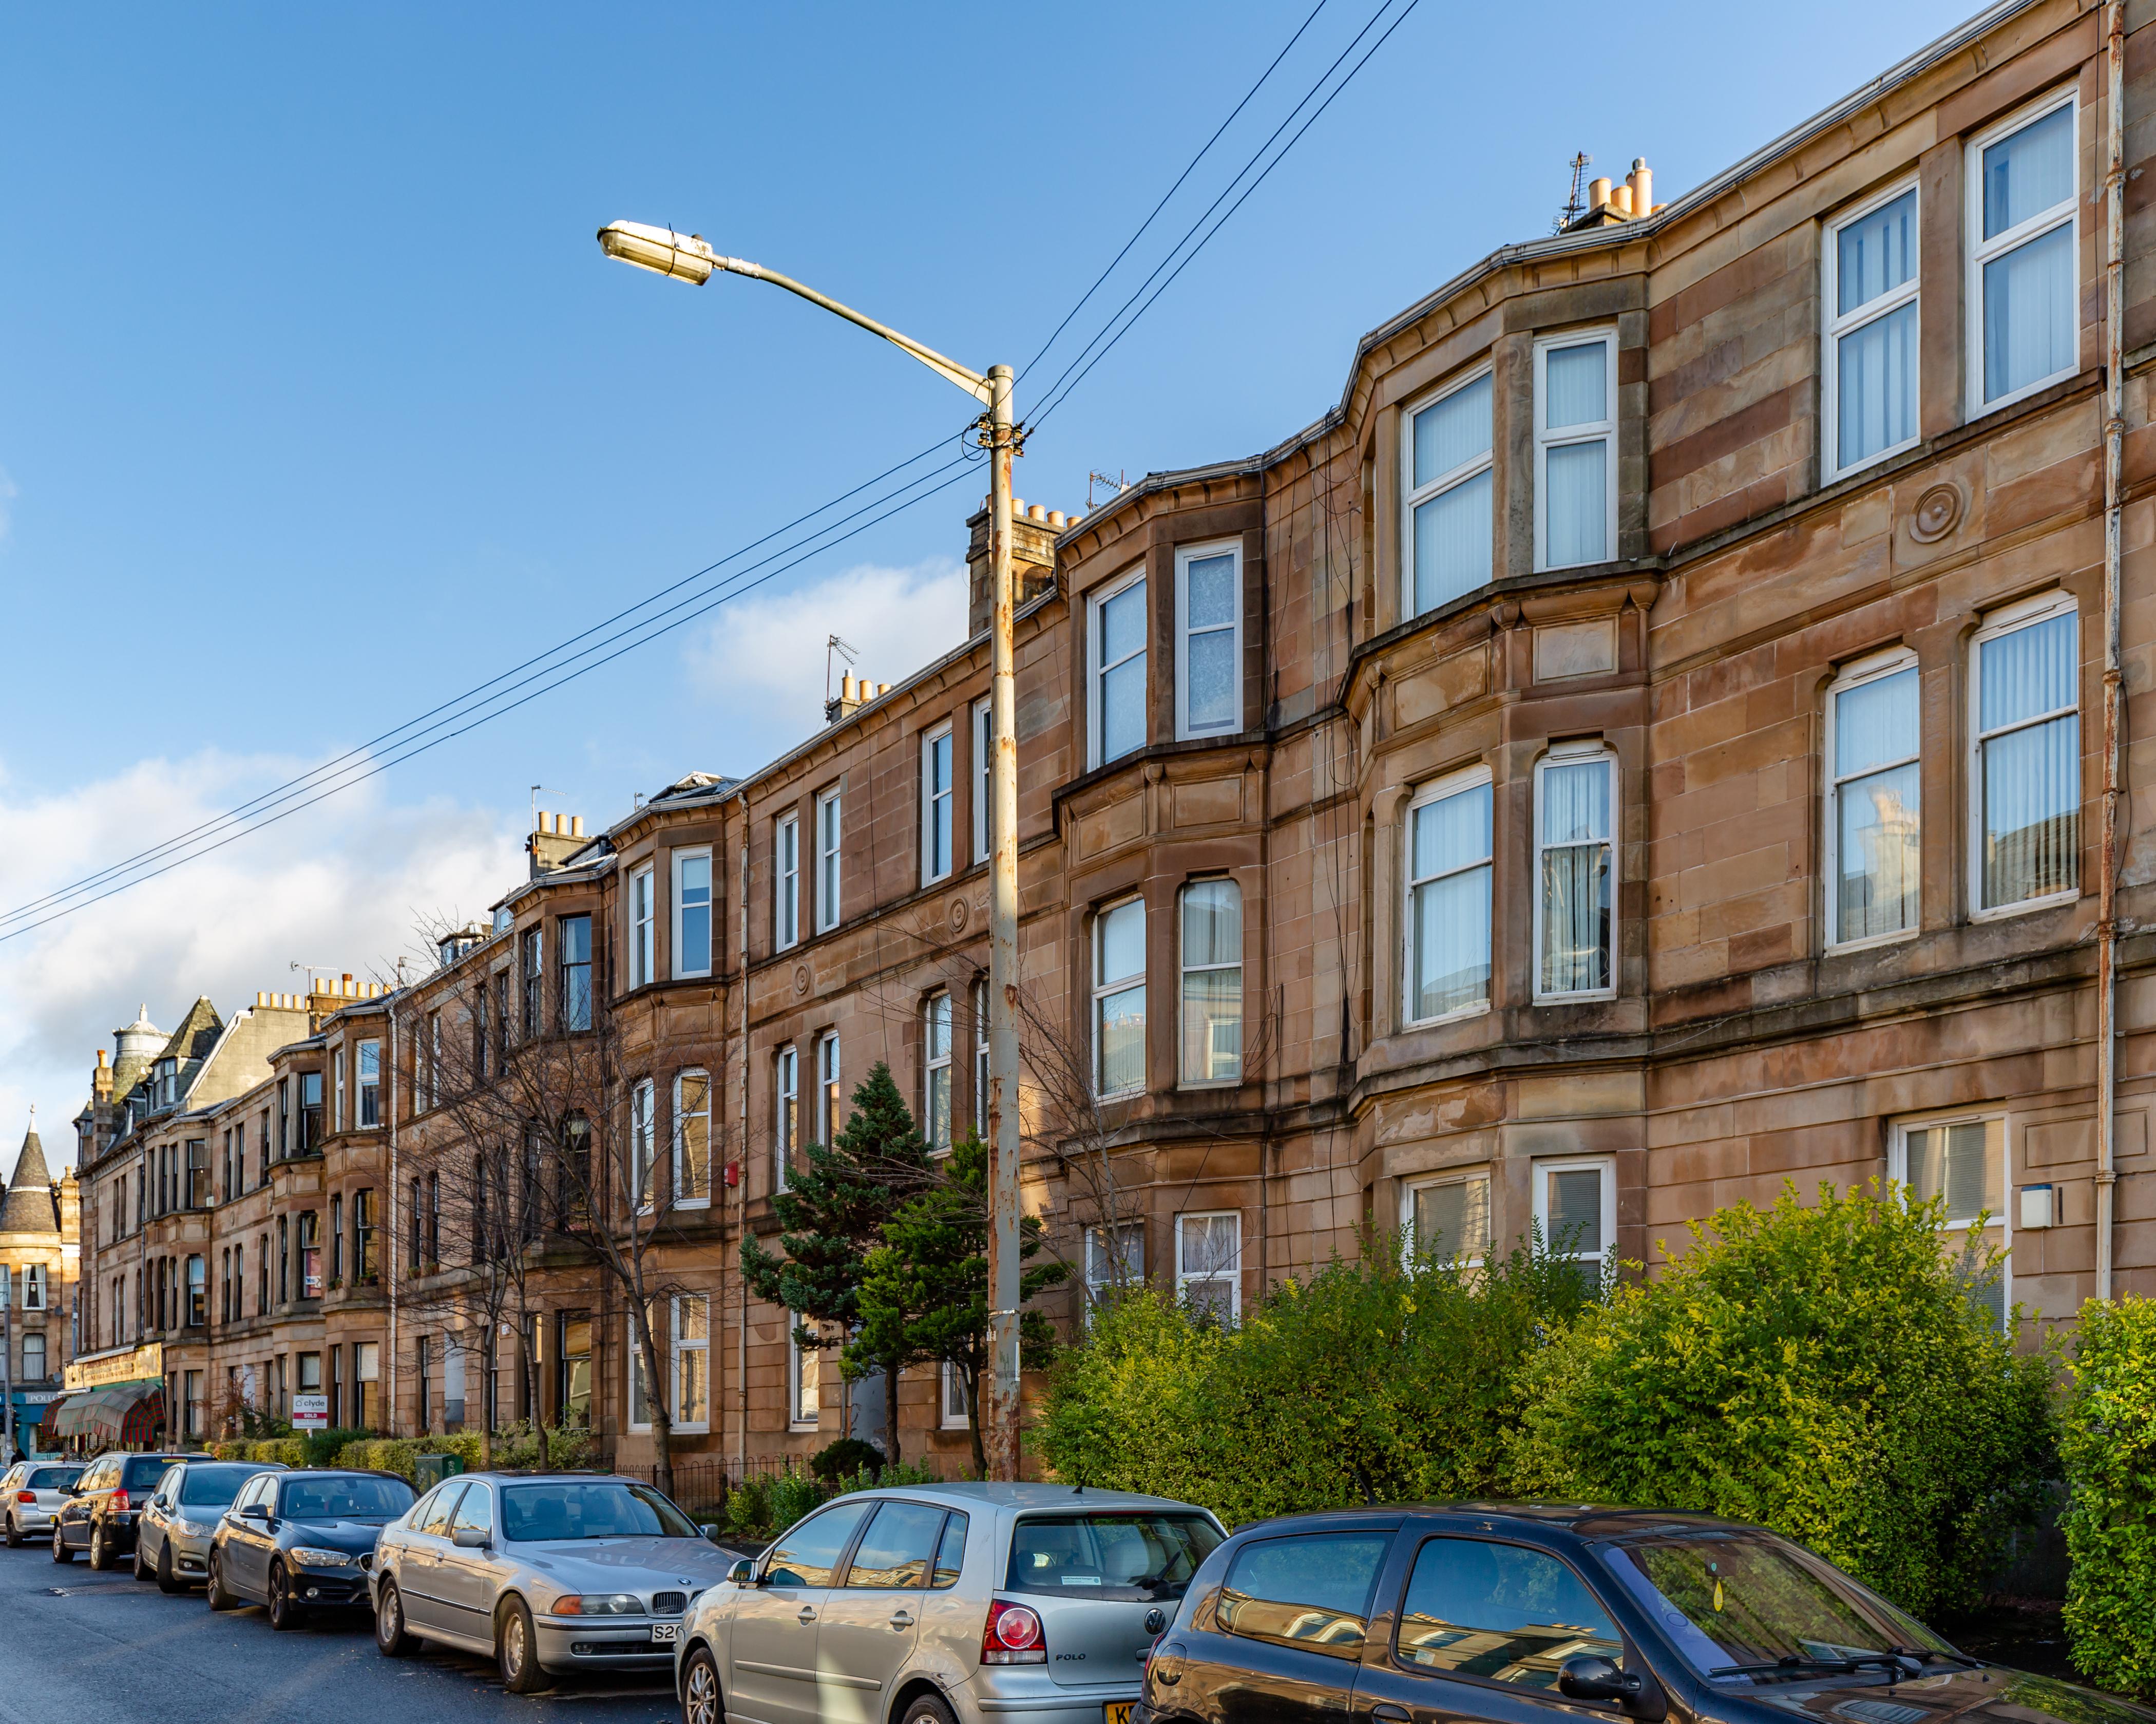 File:165-189 Kenmure Street, Glasgow, Scotland.jpg